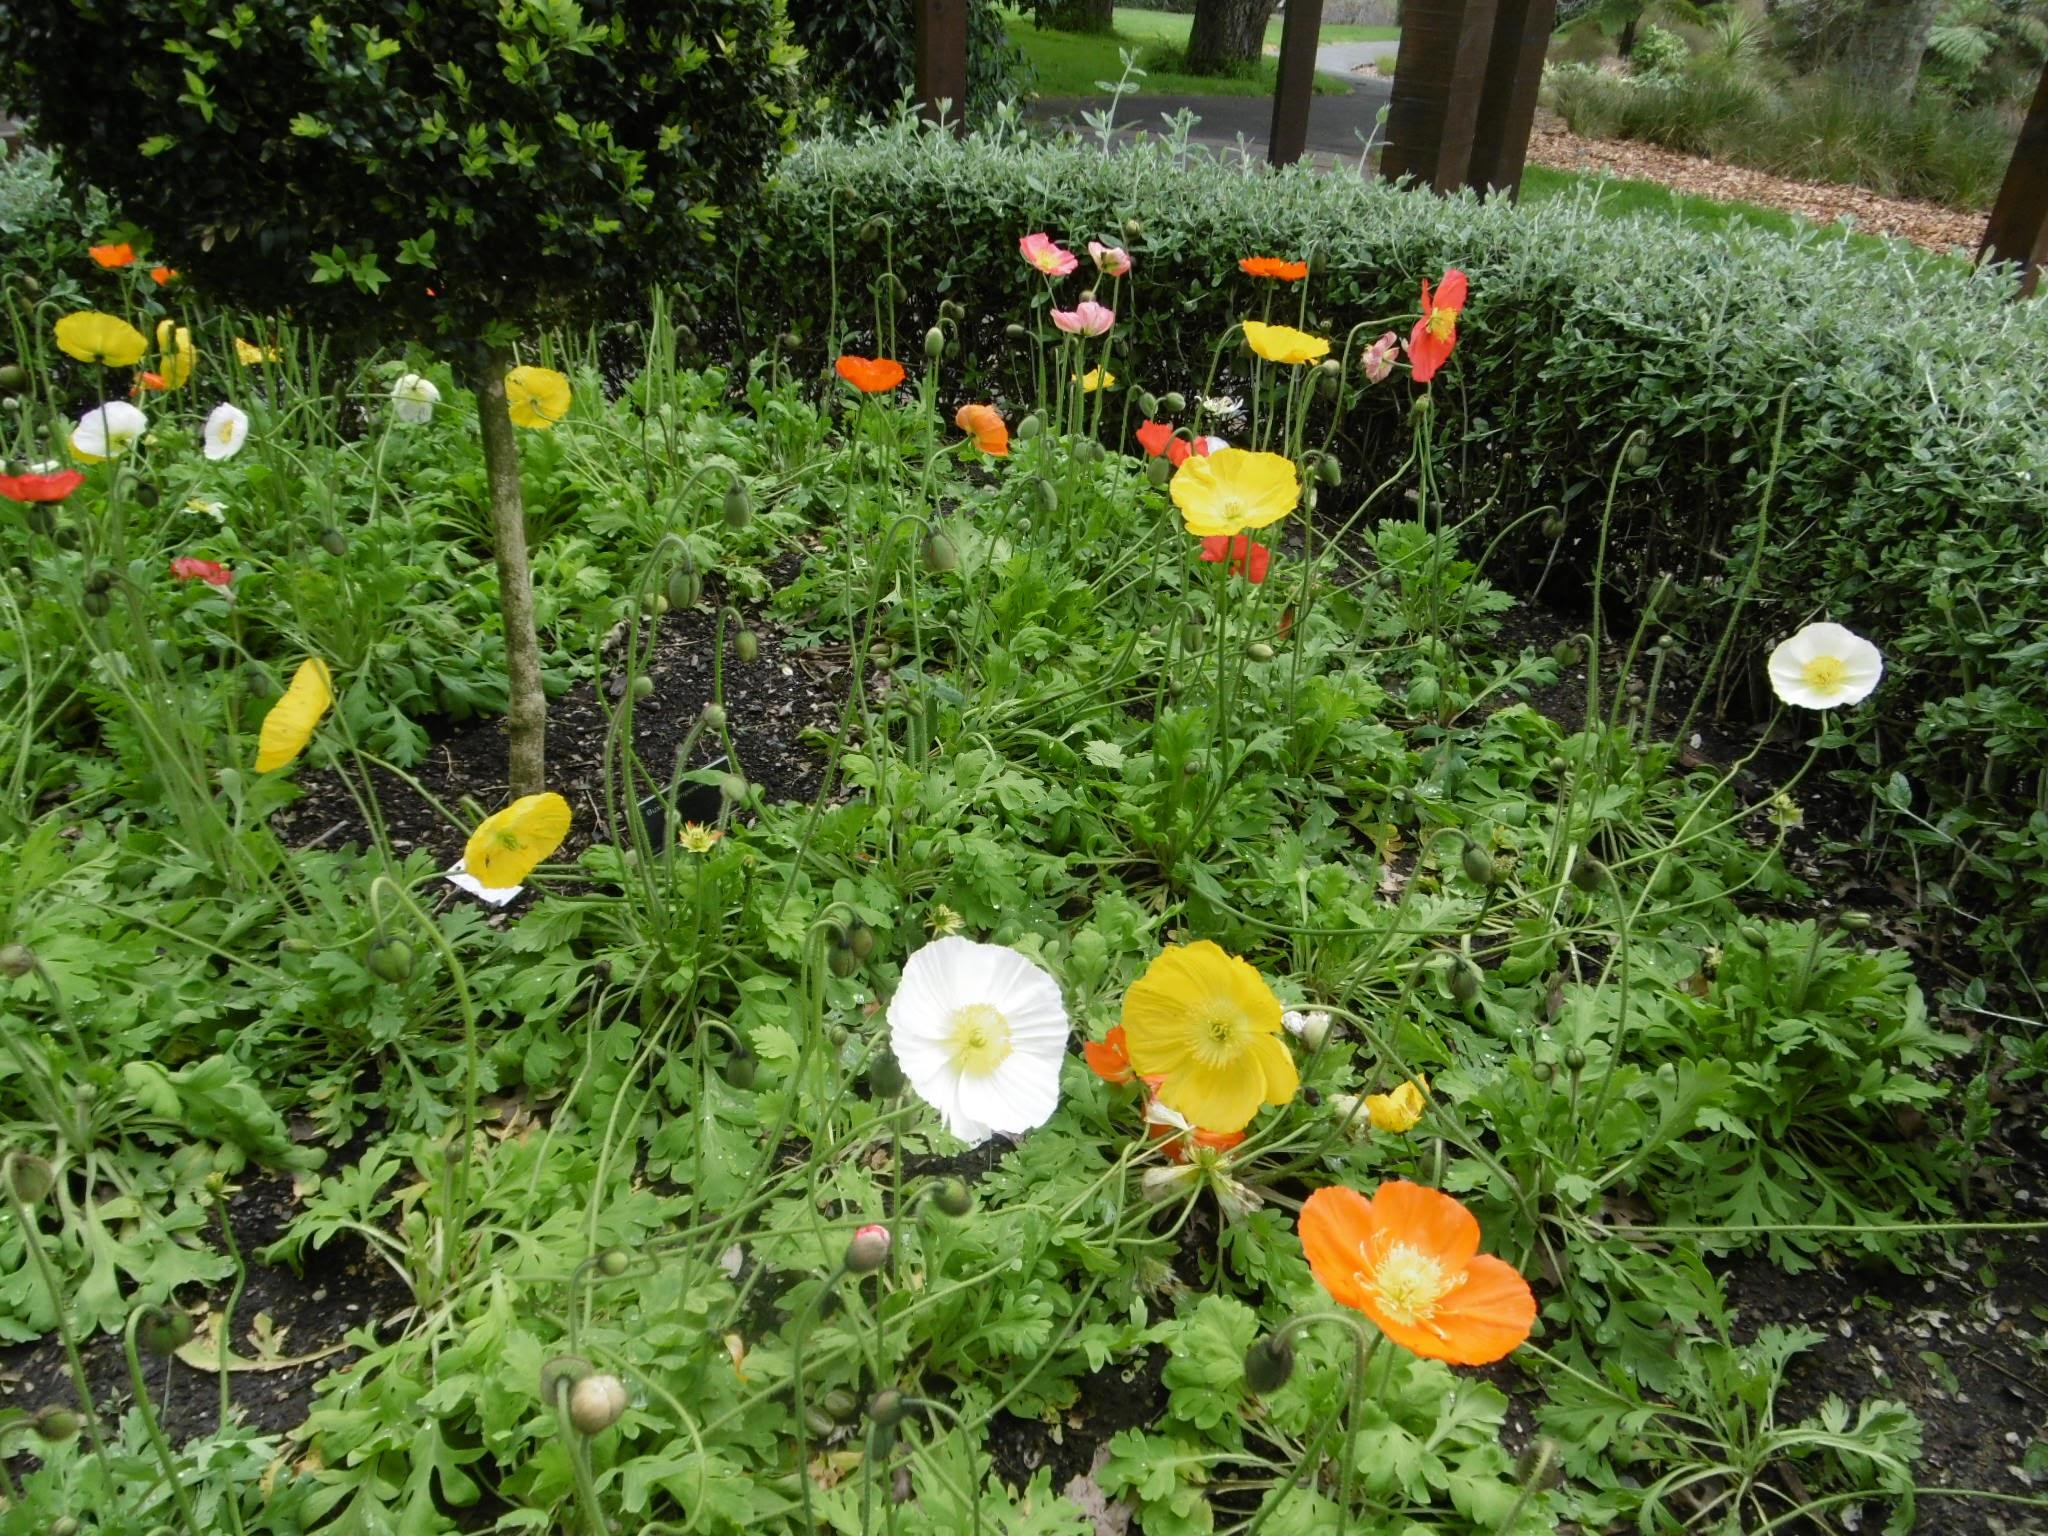 auckland-botanic-gardens-20160926-70